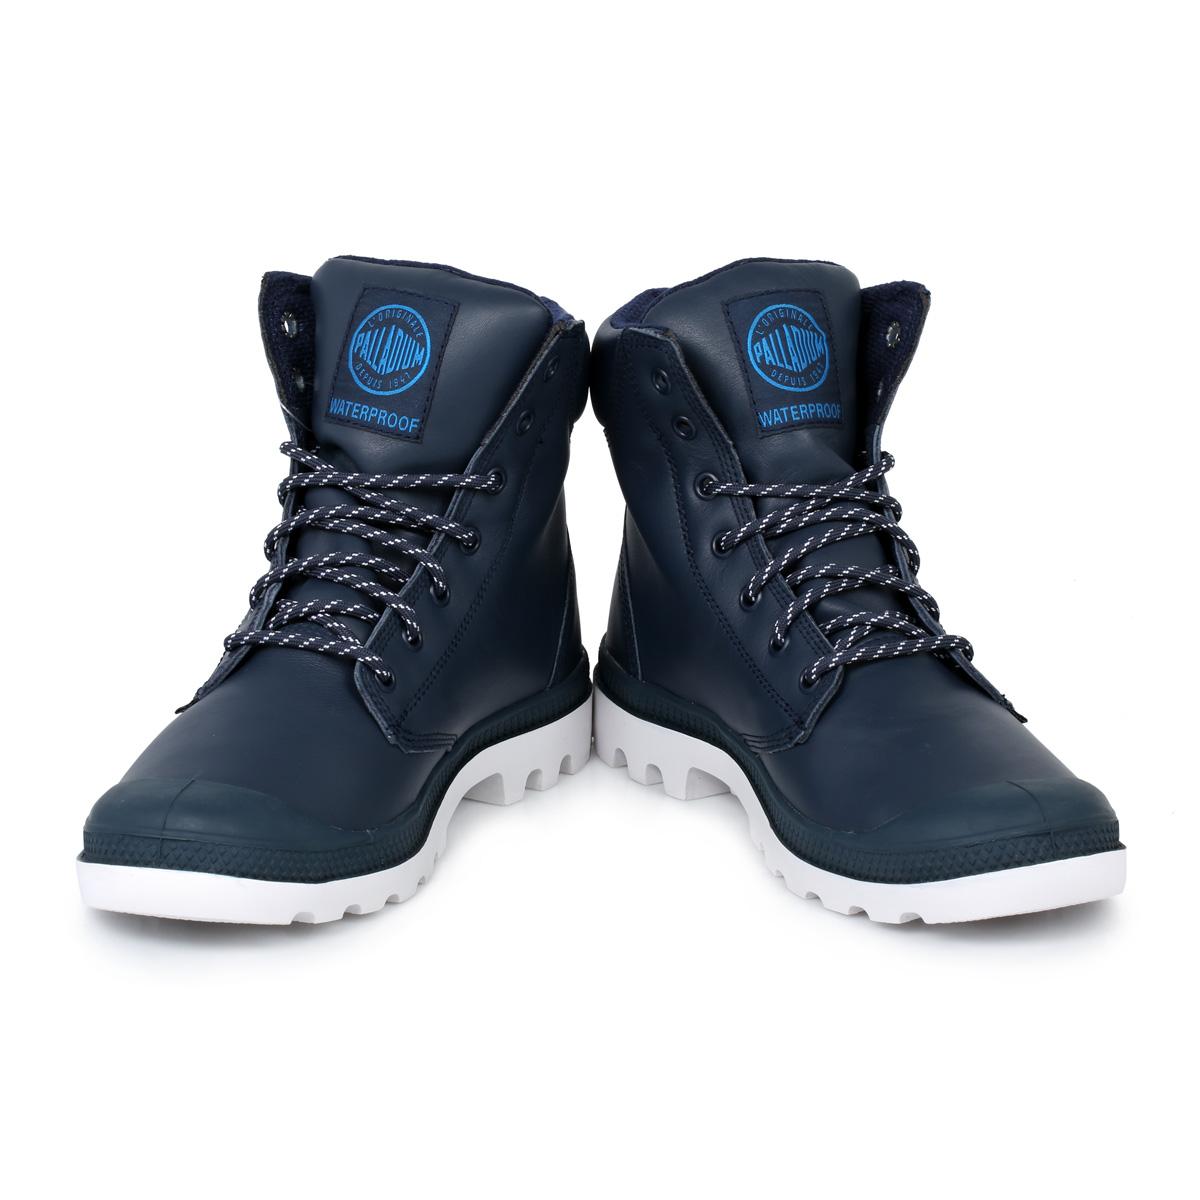 Gallery For gt Palladium Boots Men Blue